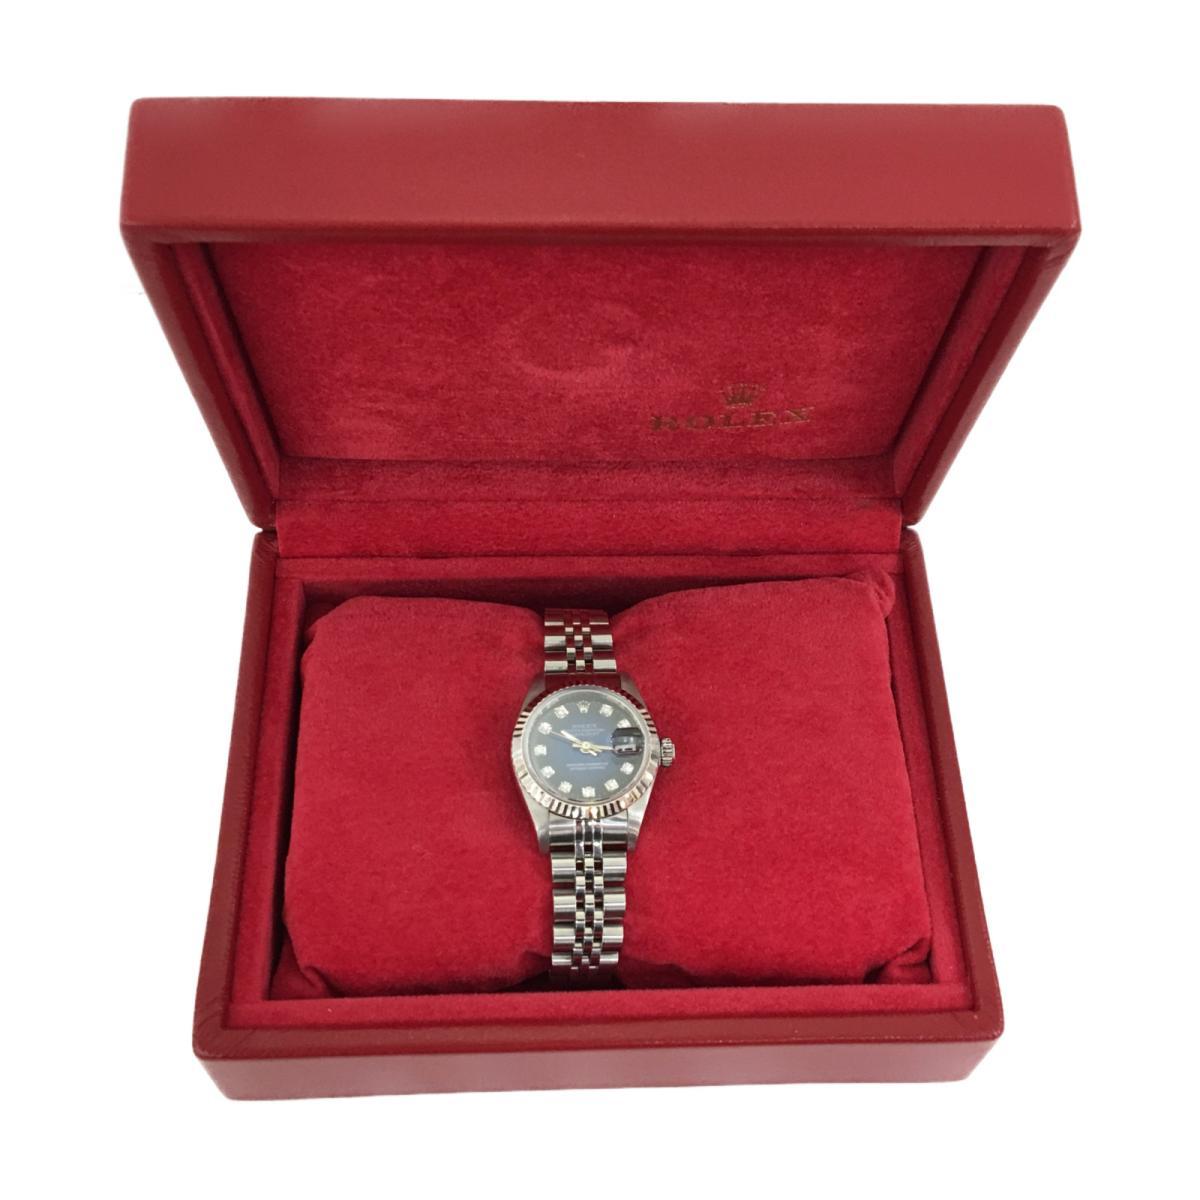 ROLEX 時計 69174G デイトジャスト 腕時計 ウォッチ